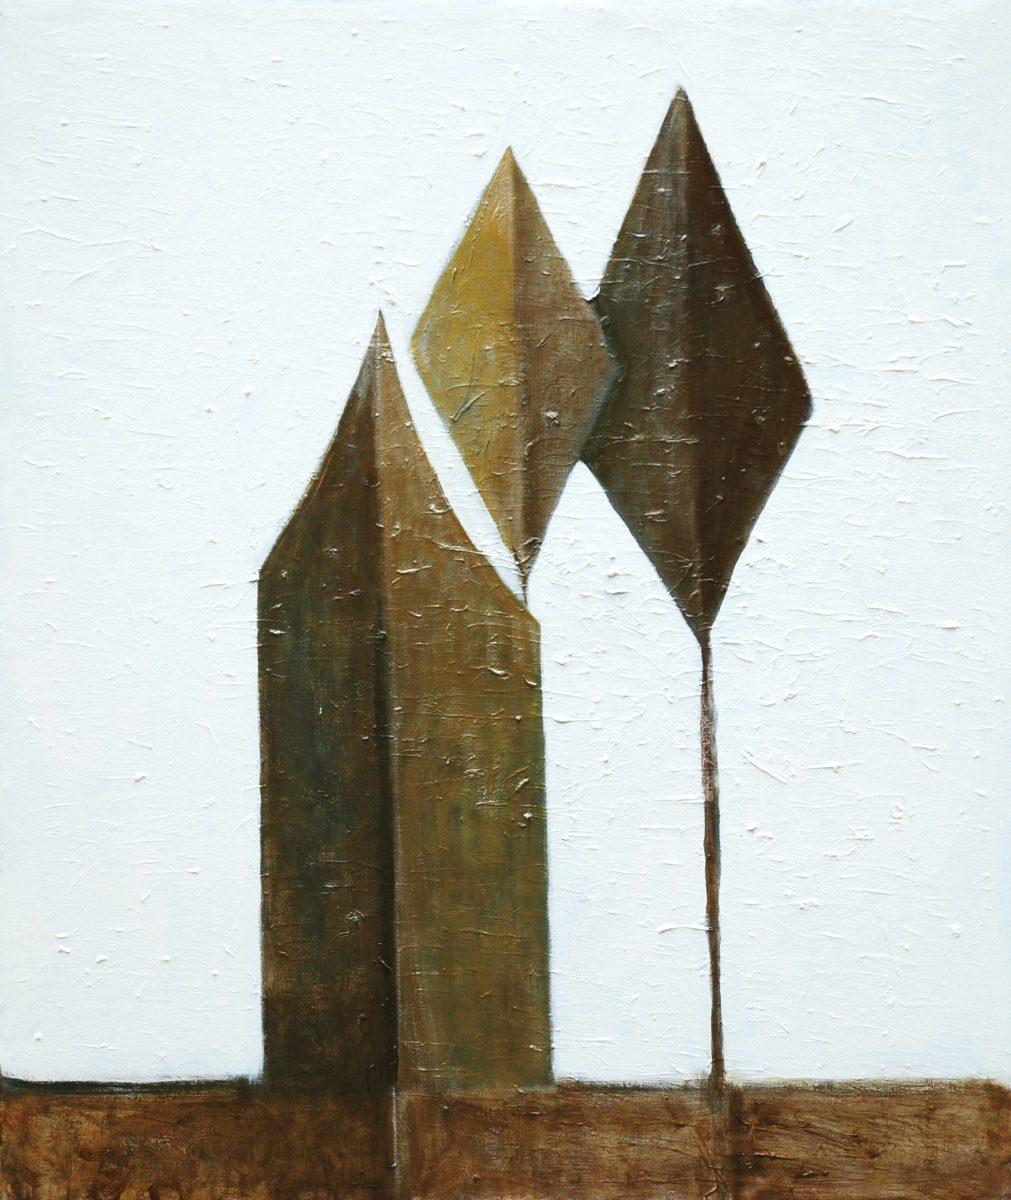 Pierantoni Verga, In attesa, tecnica mista su tela, 80x70cm, 2011